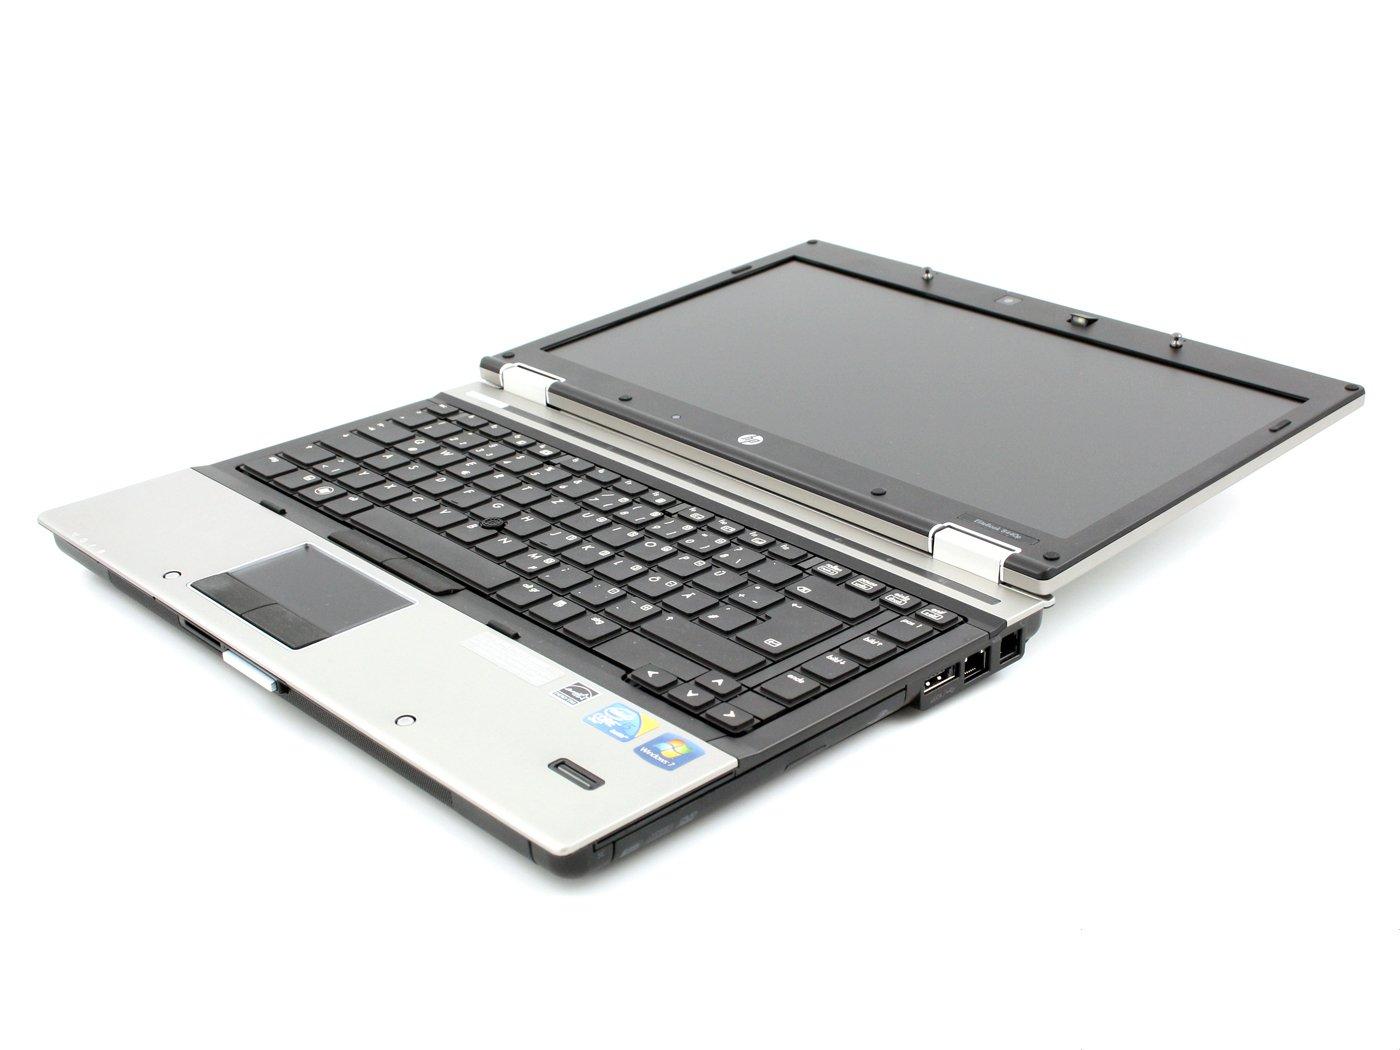 Amazon.com: HP Elitebook 8440p Laptop Notebook - Core i5 2.4ghz - 4GB DDR3  - 160GB HDD - DVD - Windows 10 64bit - (Certified Refurbished): Computers &  ...